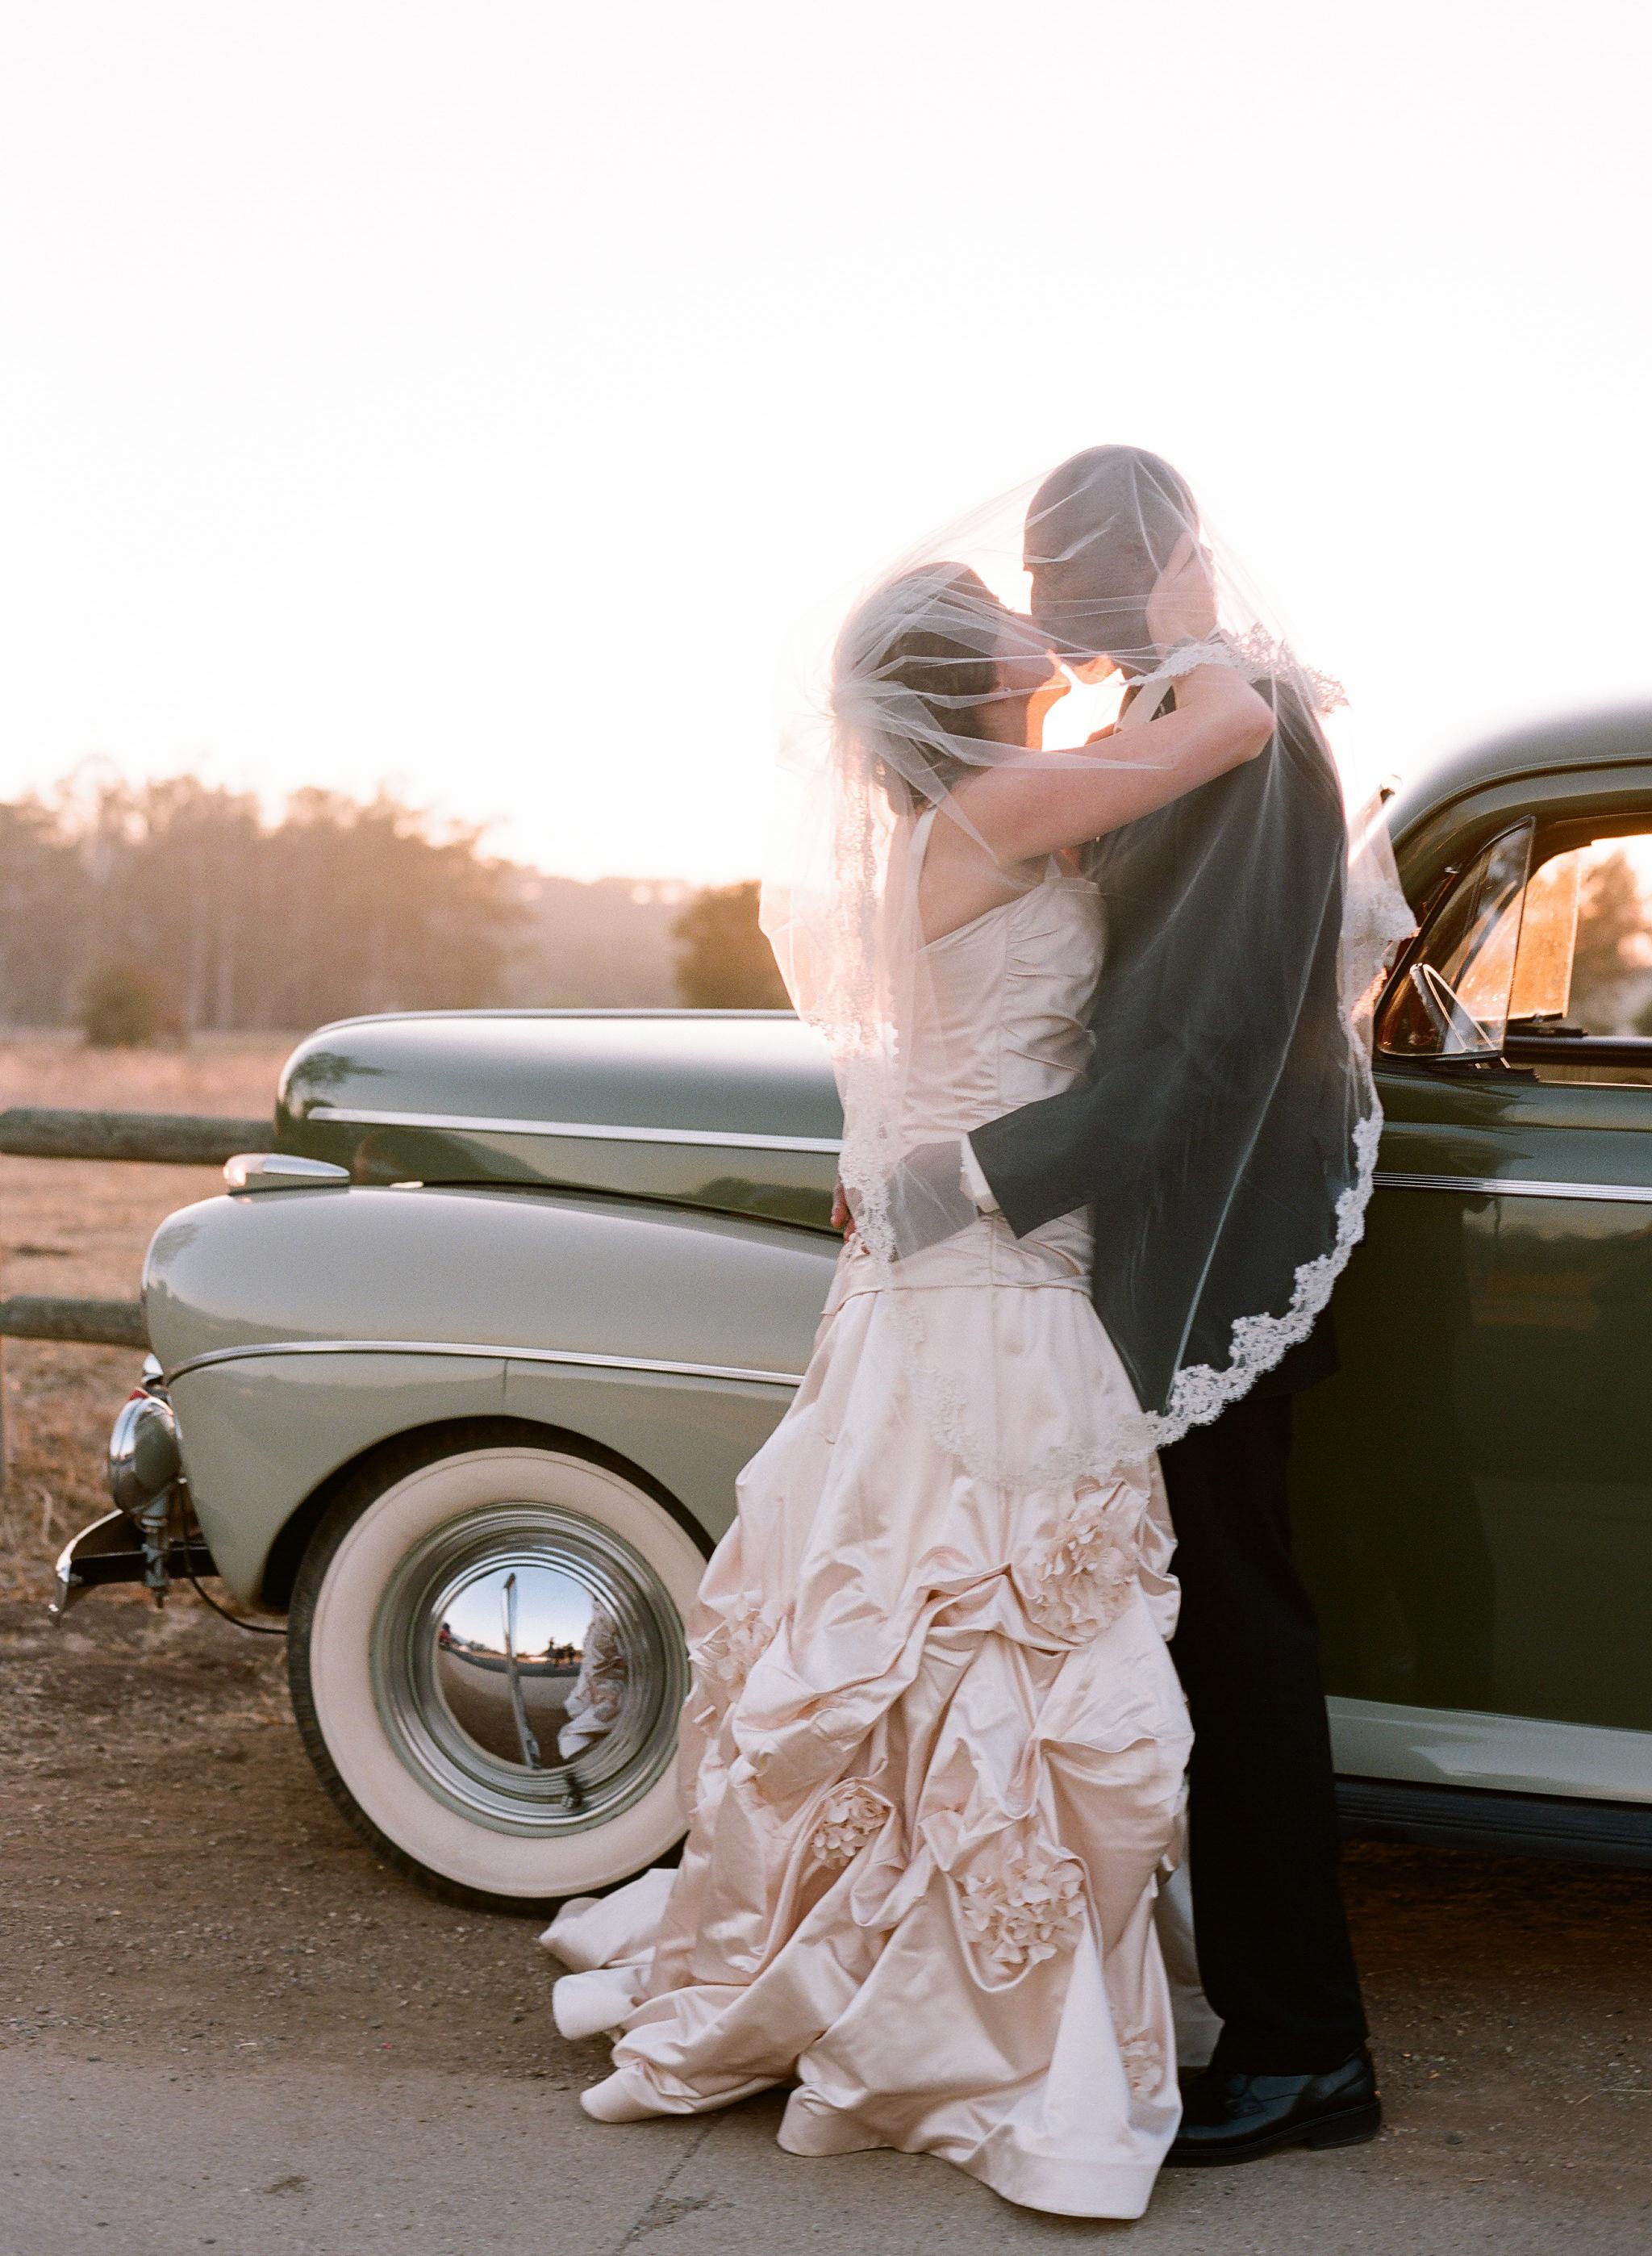 Veils, Vintage Wedding Dresses, Fashion, blue, Vintage, Bride, Groom, Veil, Wedding, Car, Elizabeth, Valley, Ojai, Messina